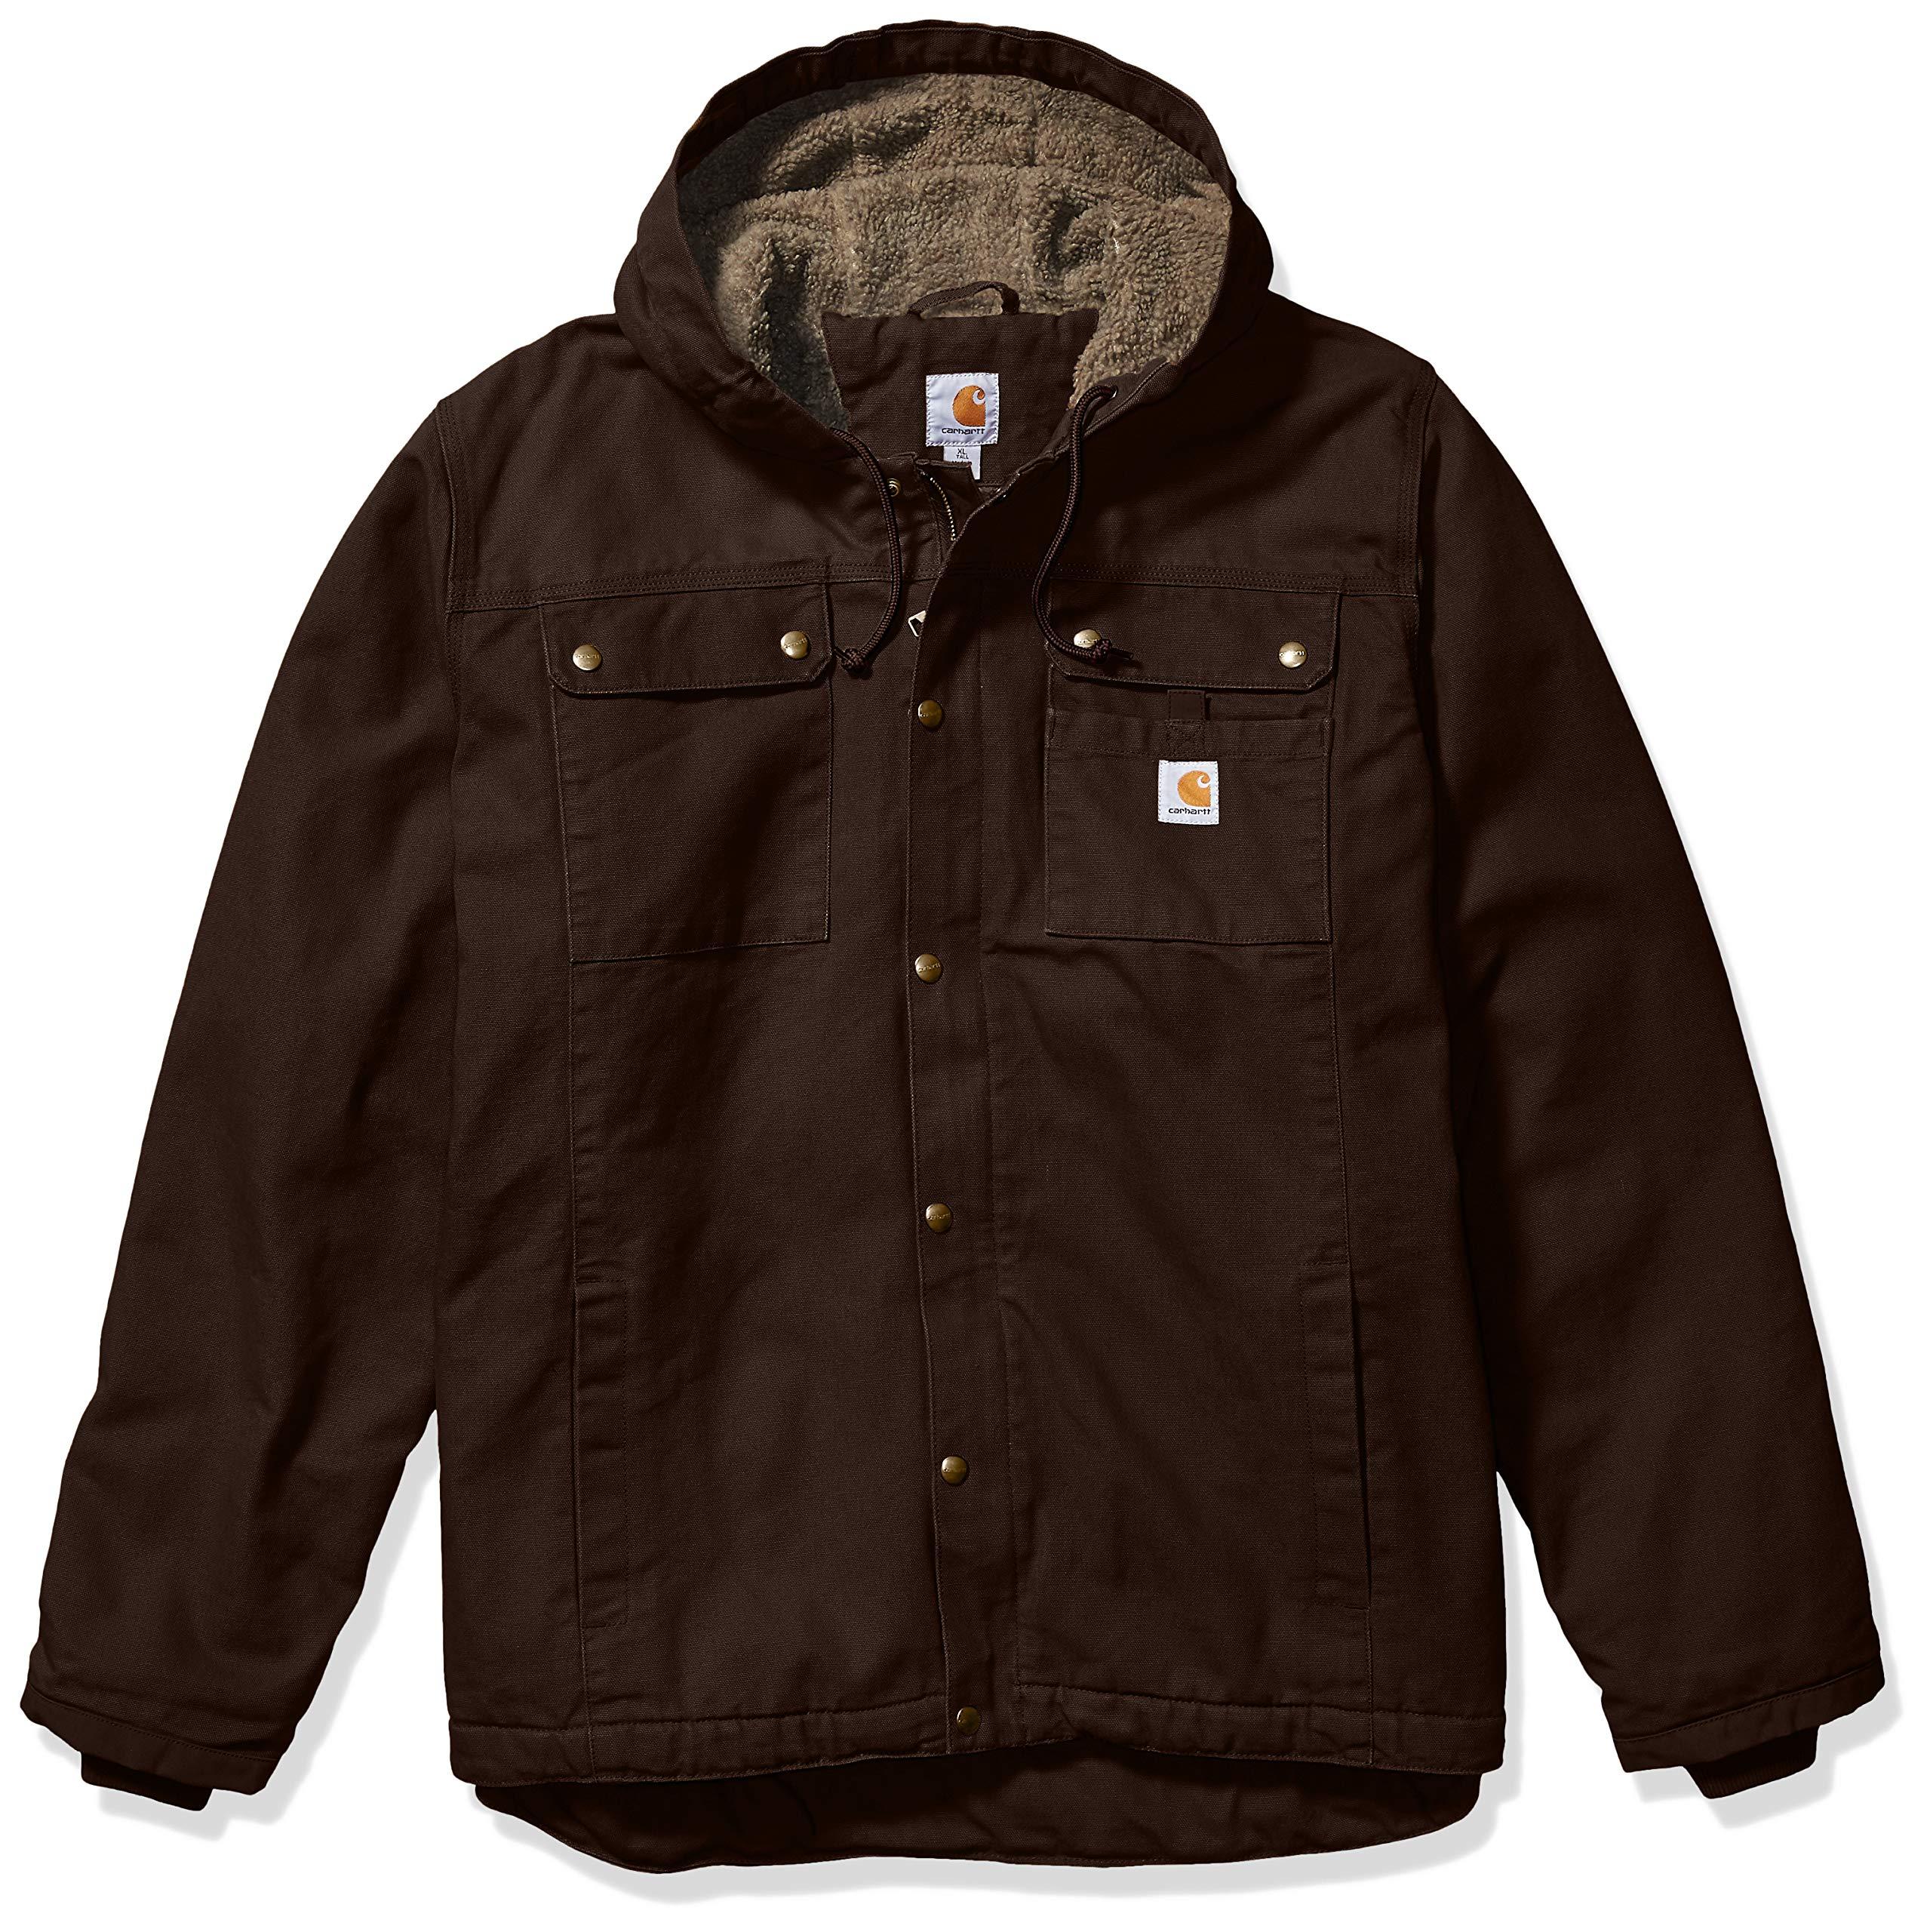 Carhartt Men's Big Bartlett Jacket (Regular and Big & Tall Sizes), Dark Brown, 3X-Large/Tall by Carhartt